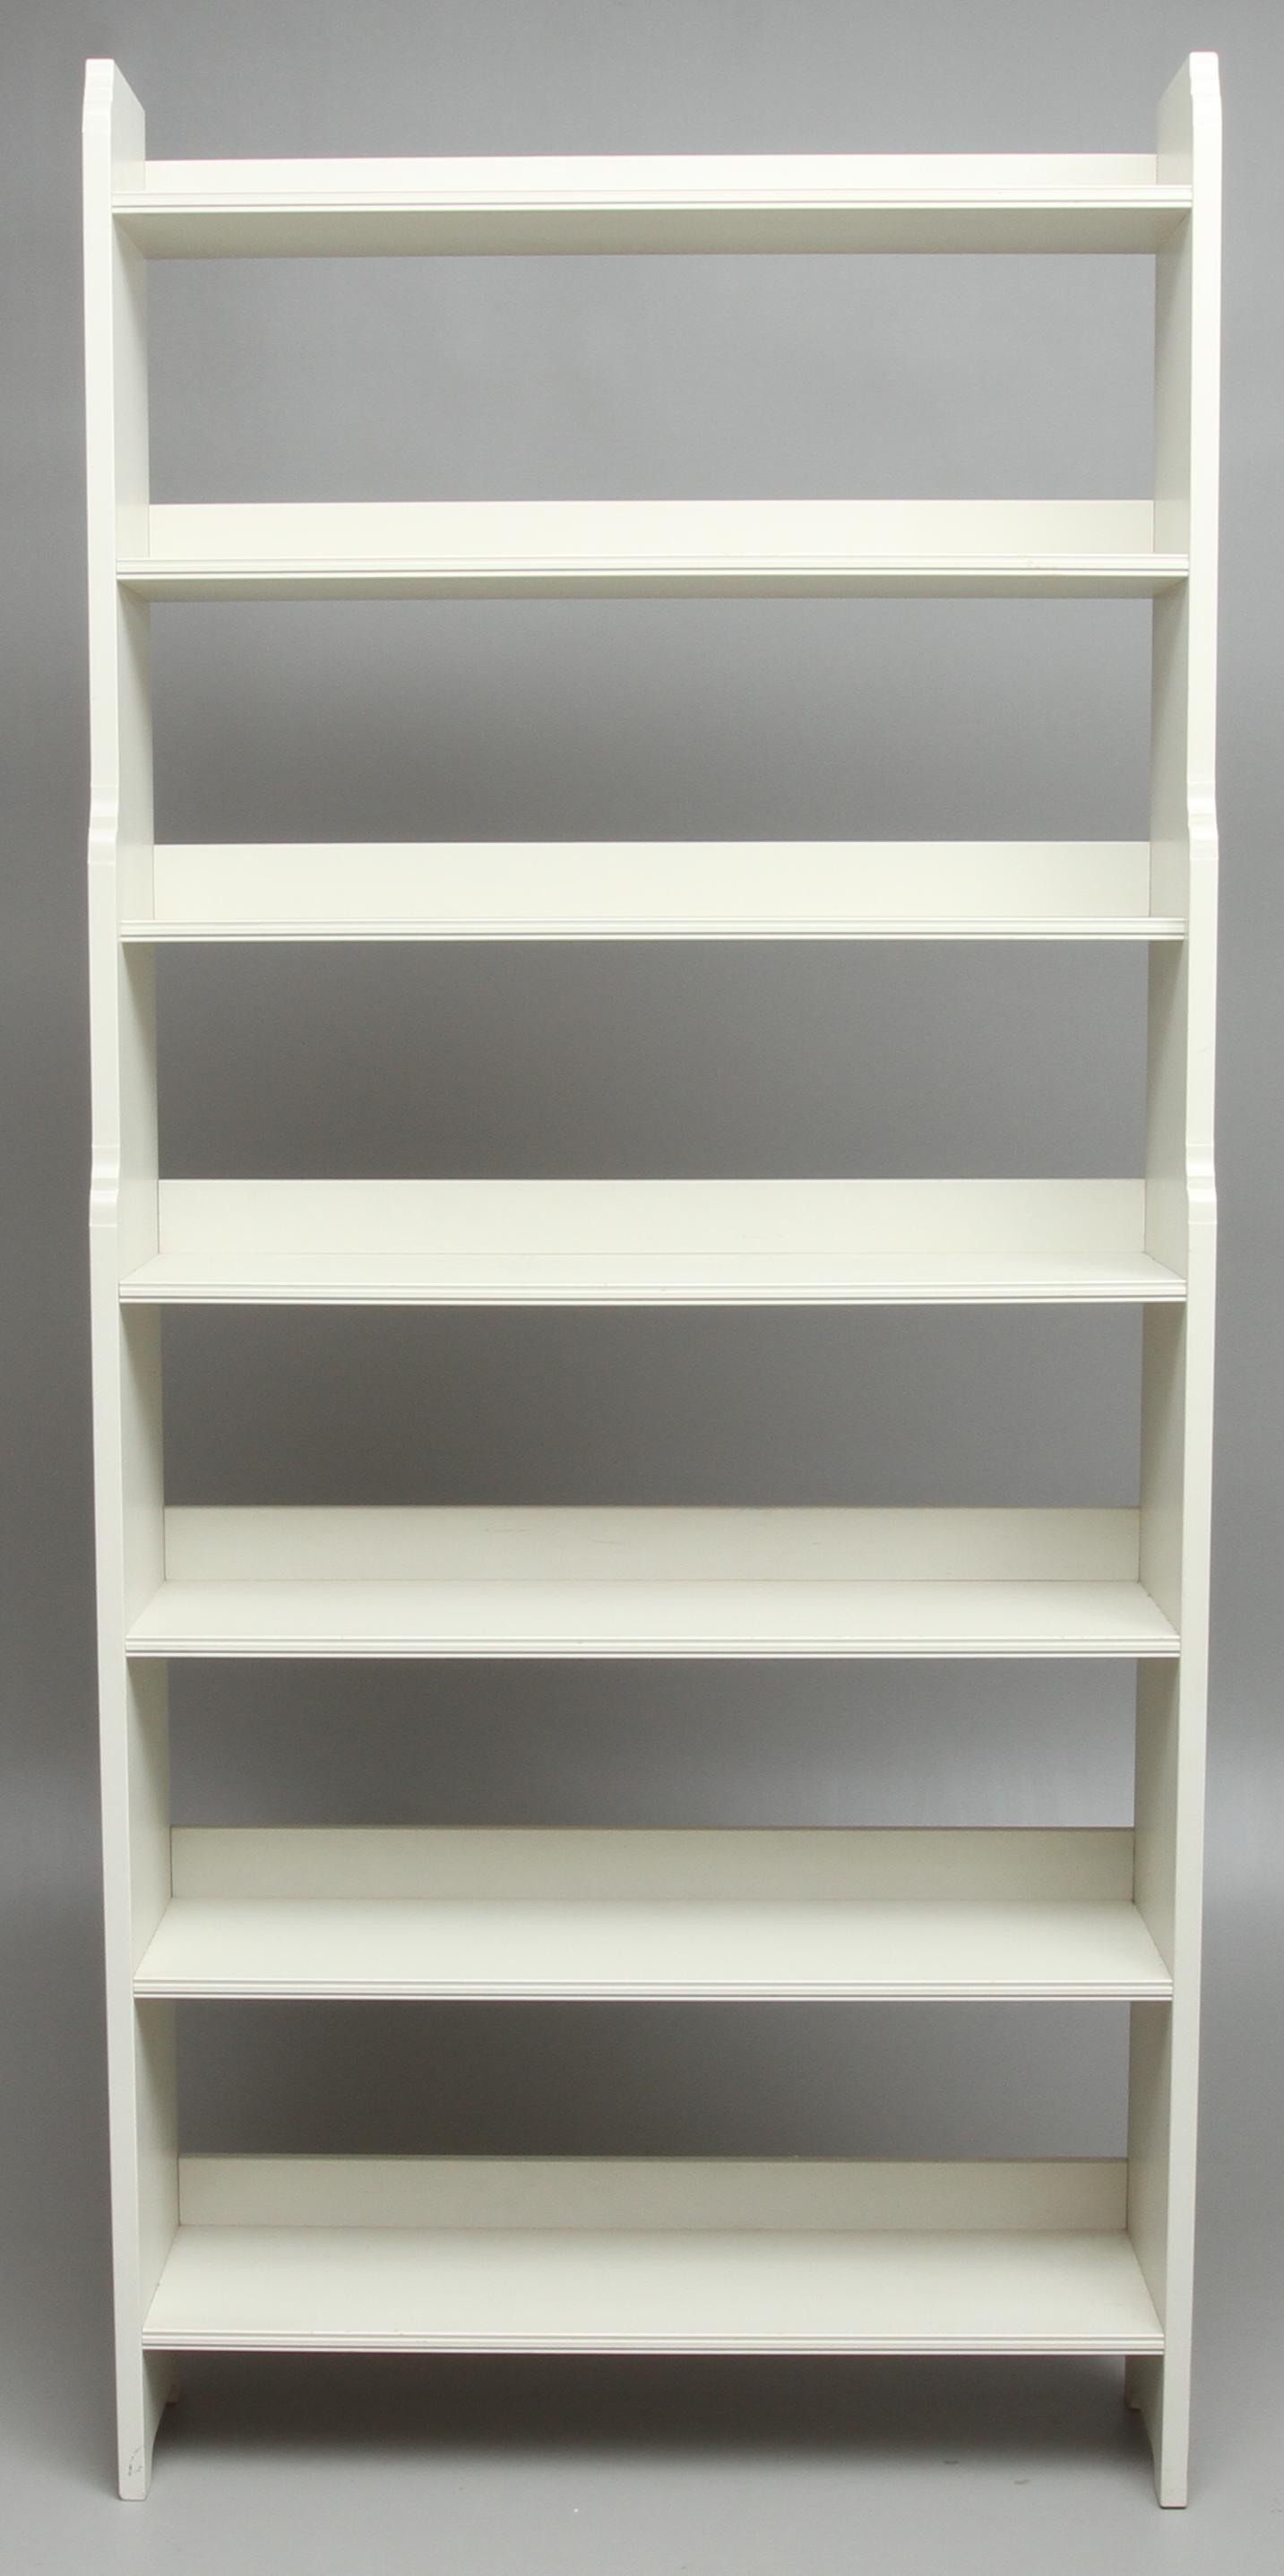 "Bilder för 16765 BOKHYLLA,""Ekolsund"" ur IKEAs 1700 talsserie, 1990 tal u2013 Auctionet"